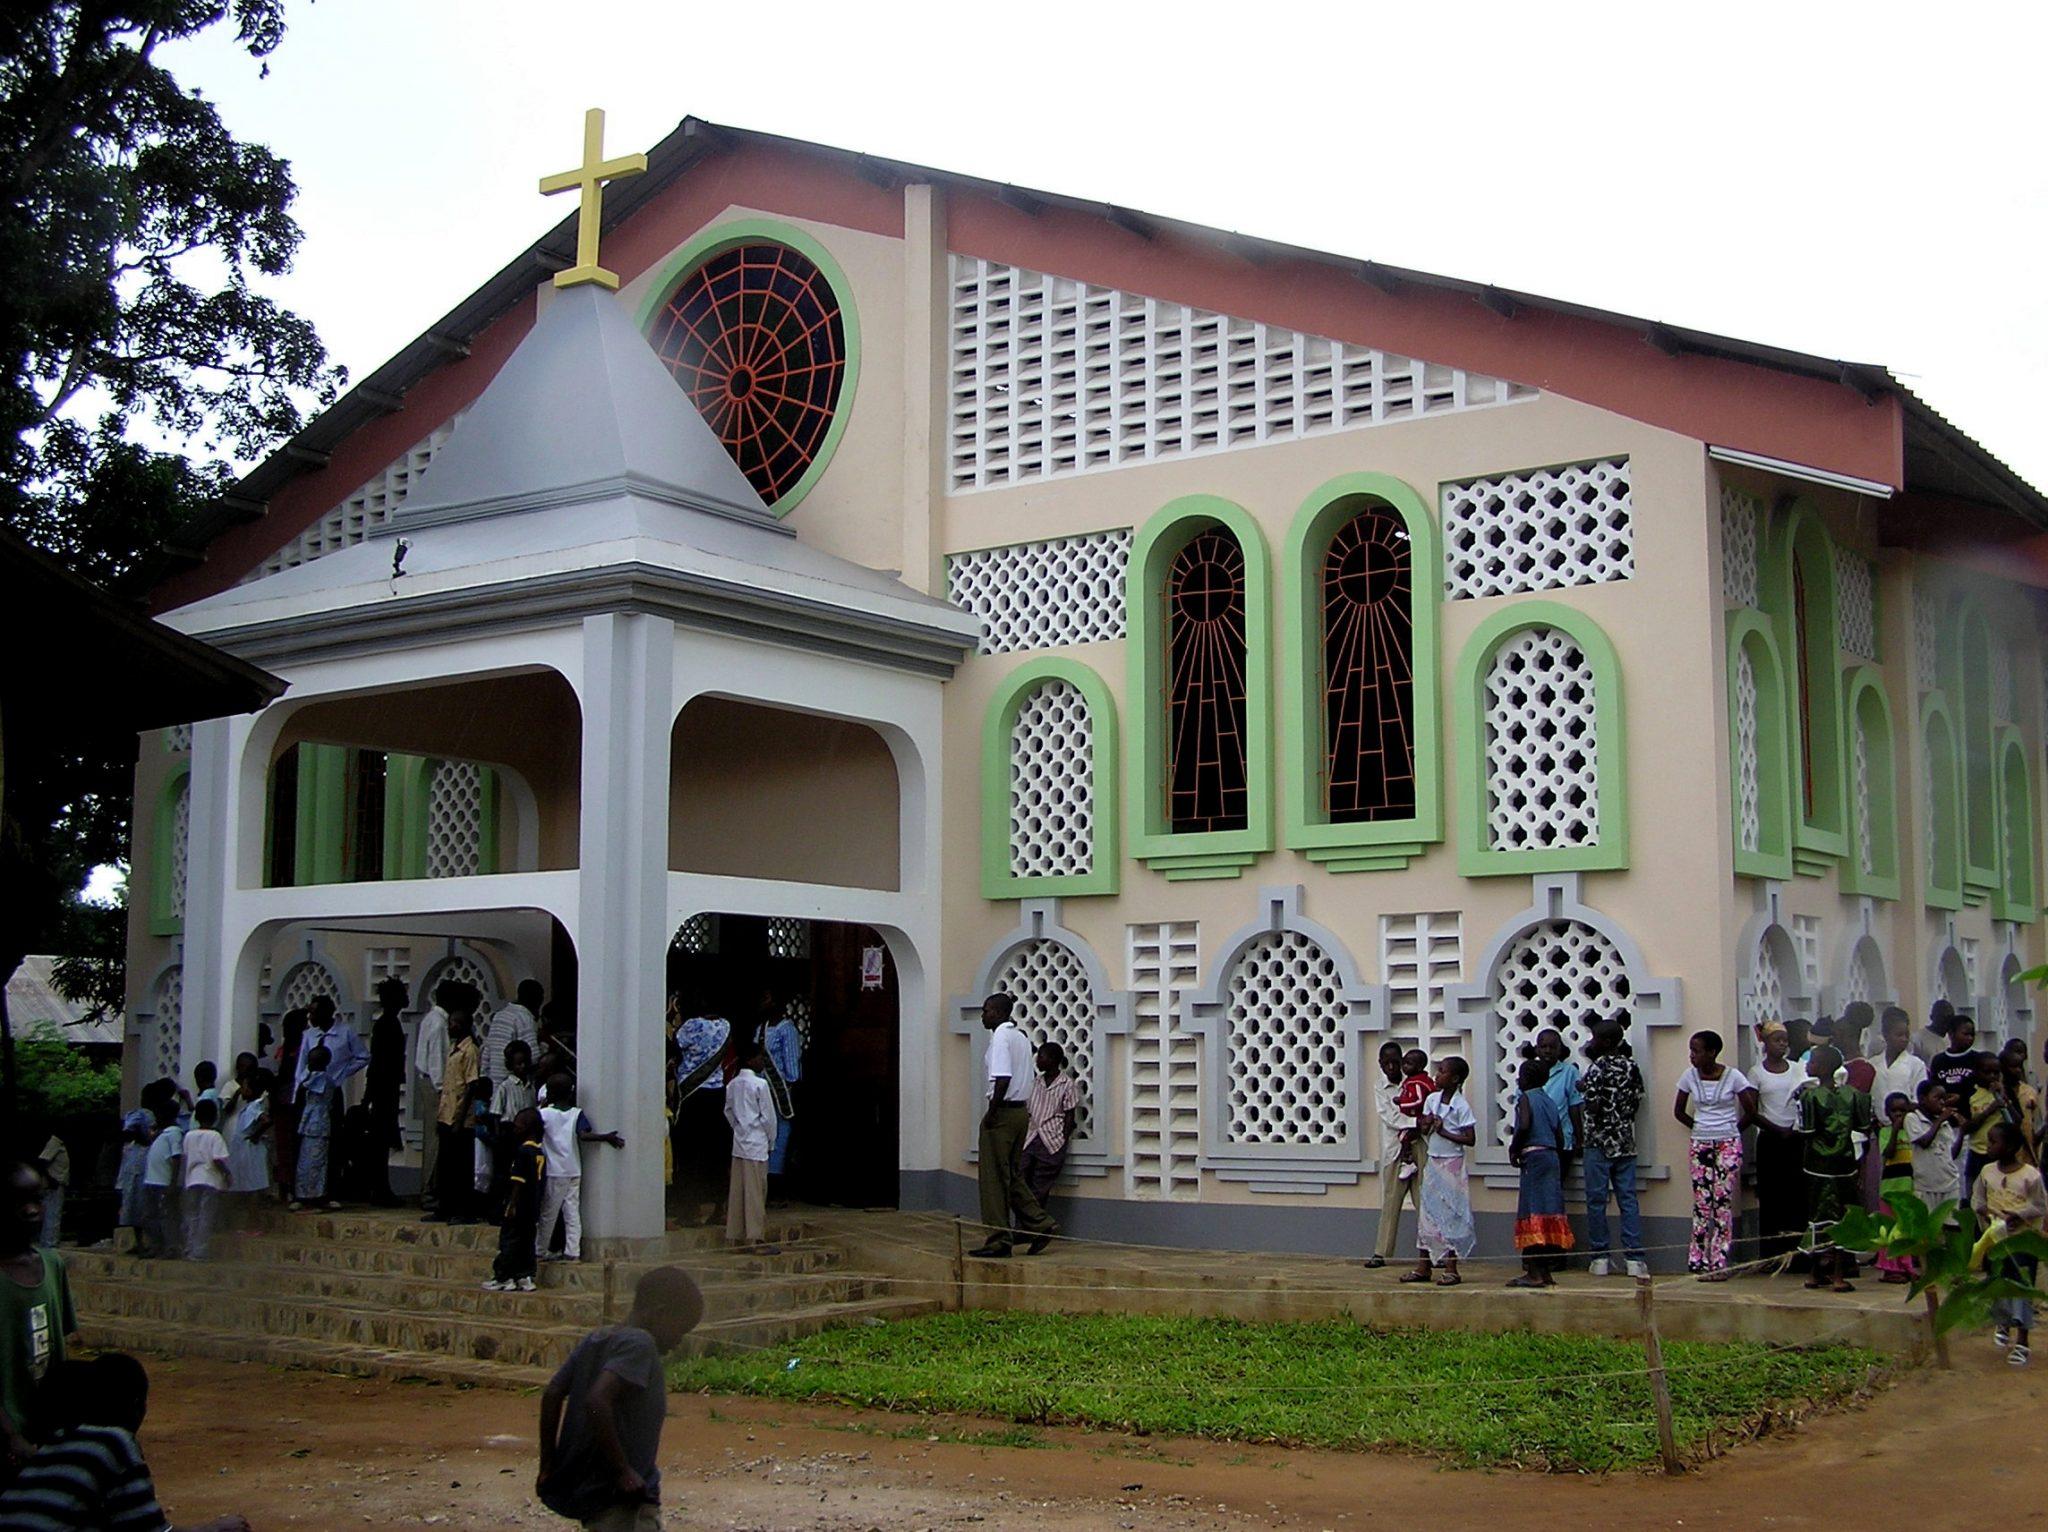 Malindi, Kenya: When Death Comes Unannounced